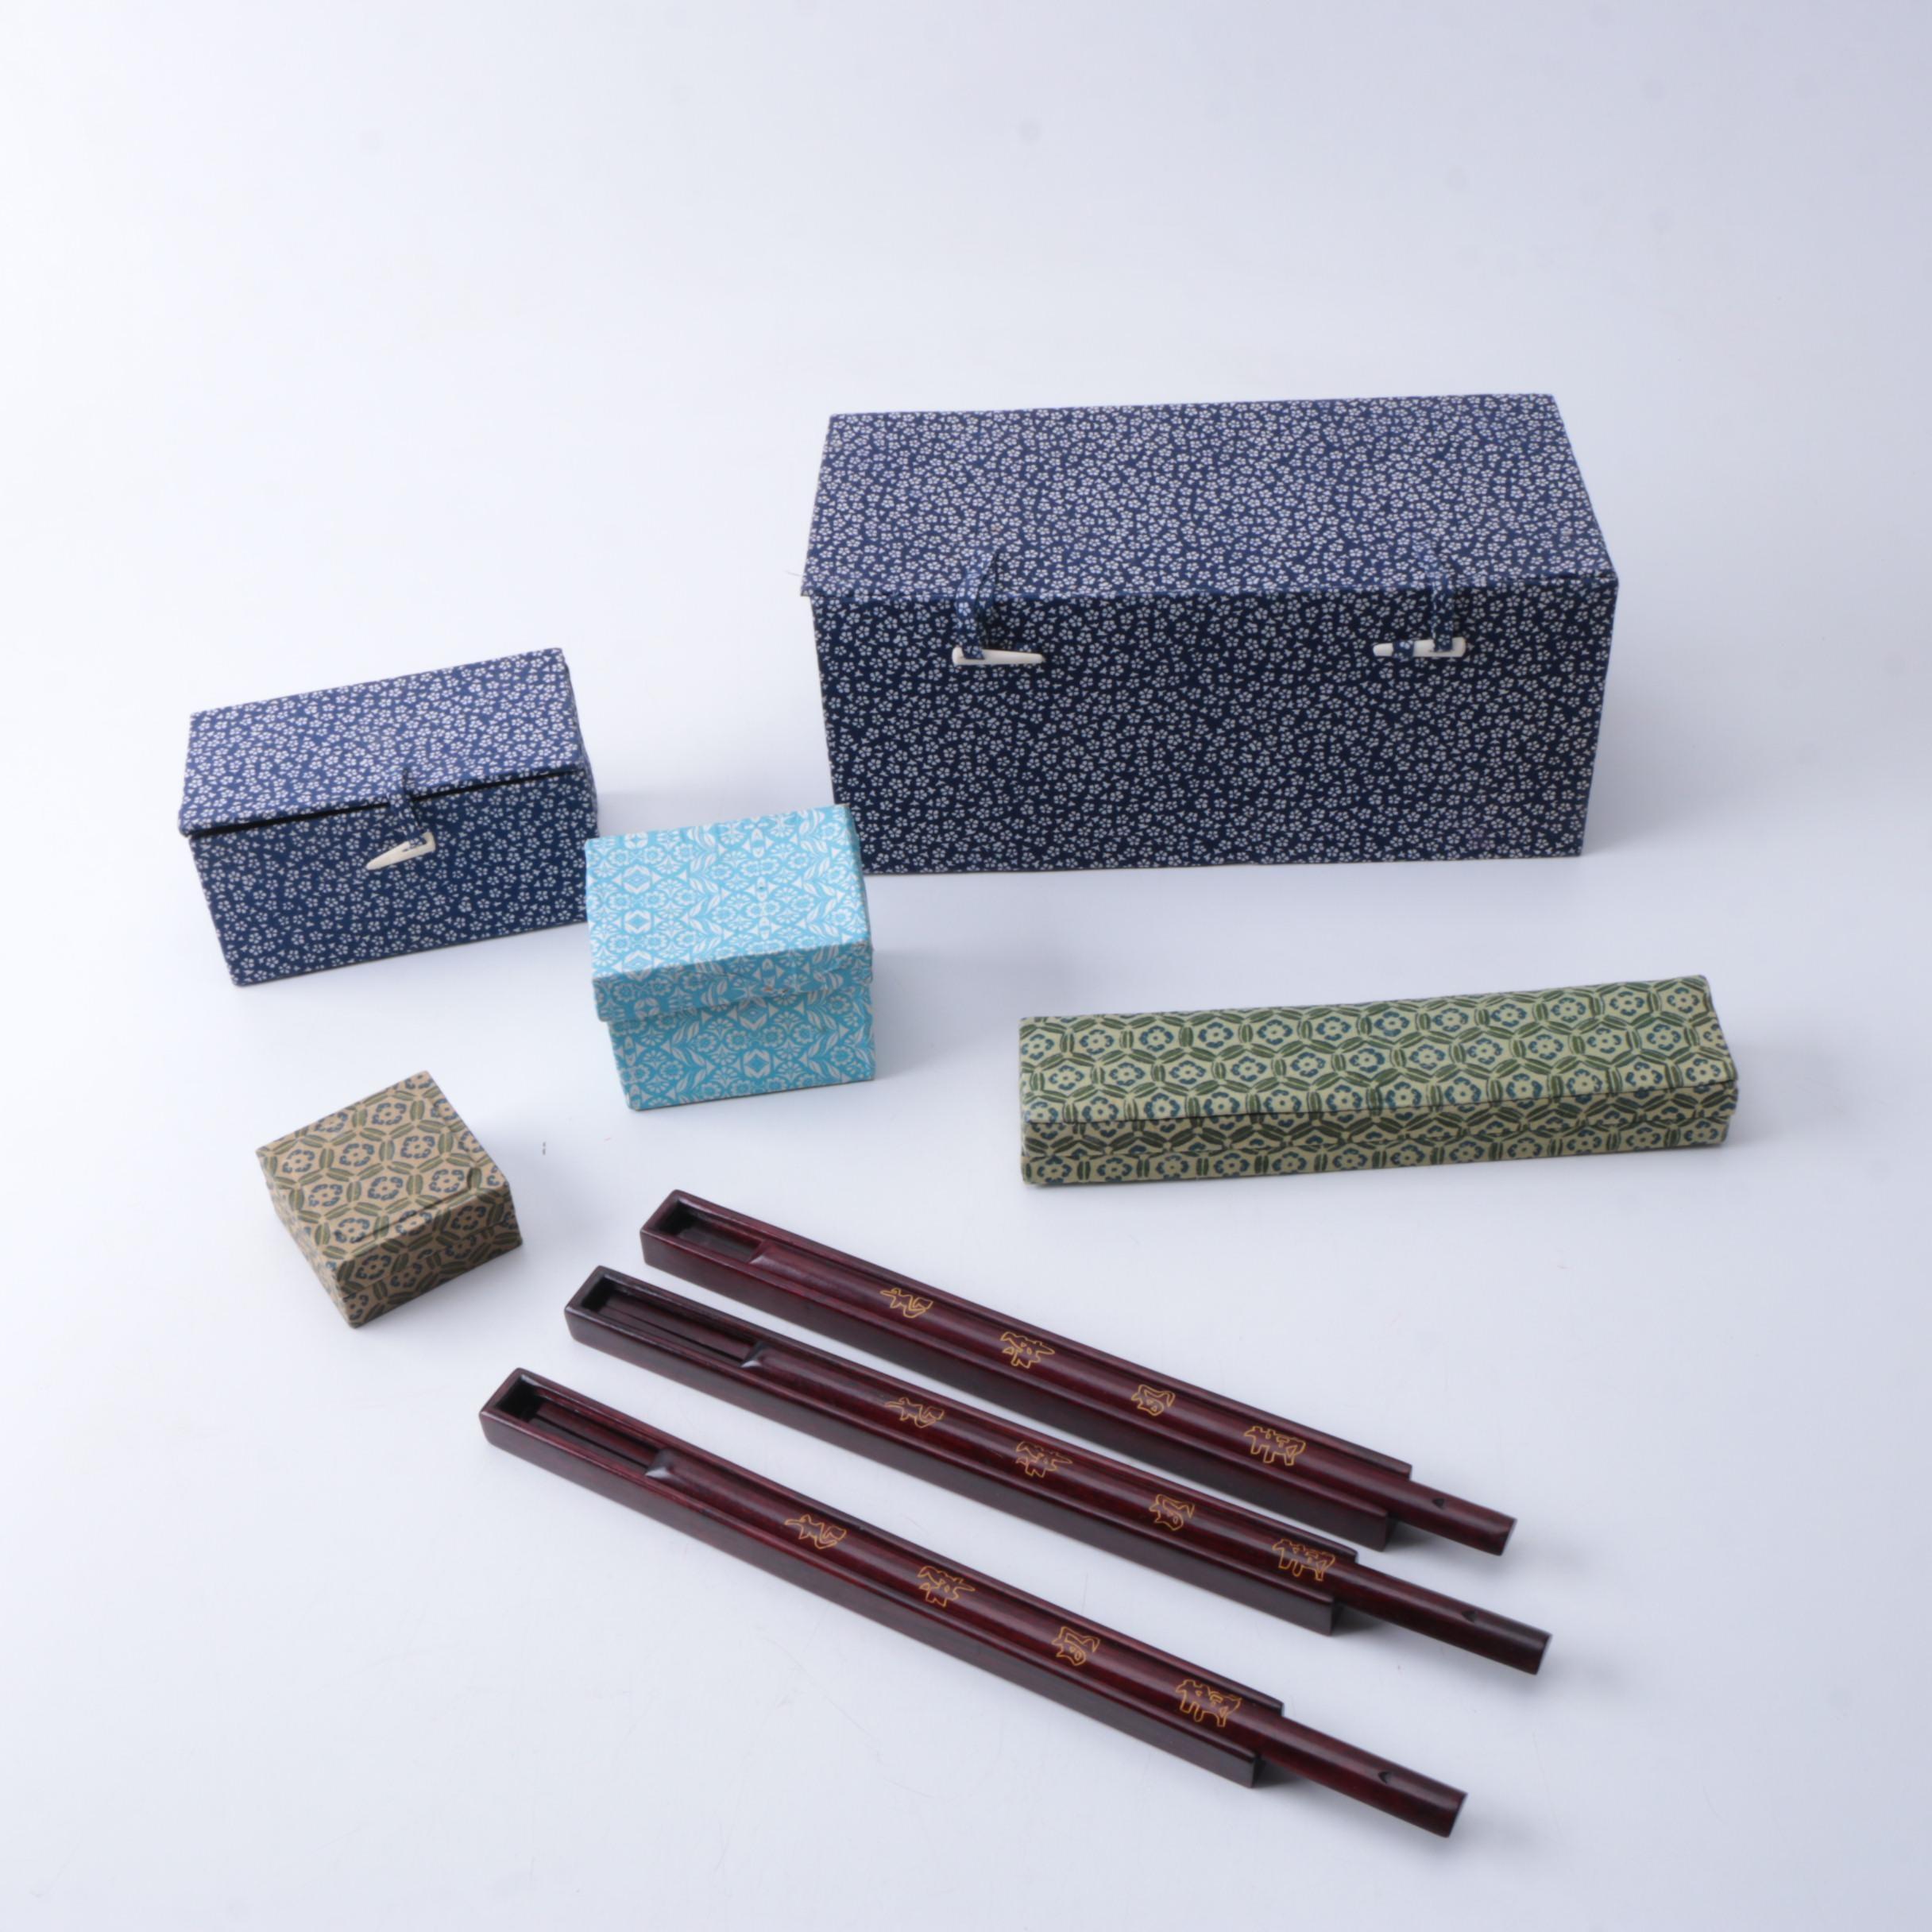 Stone Figures, Chopsticks and Pendants